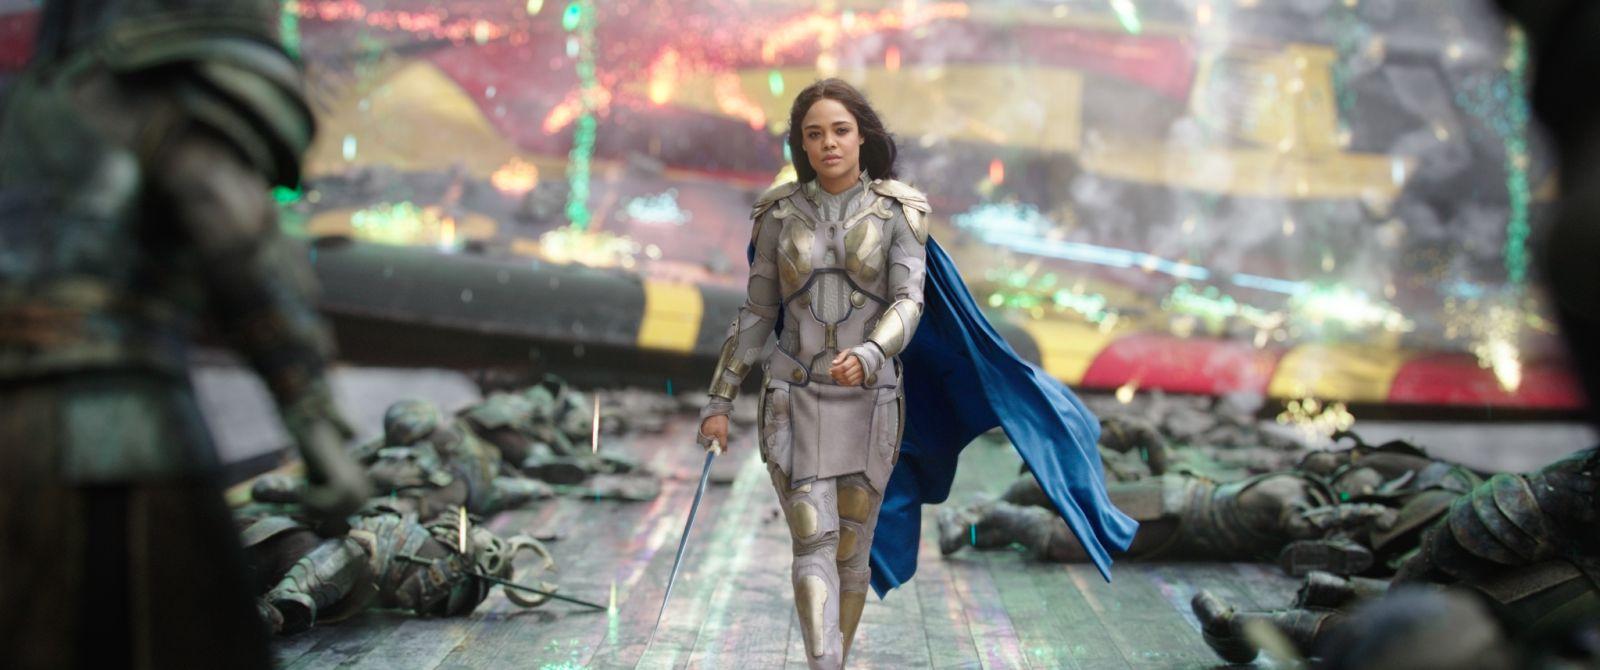 Valkyrie in Thor Ragnarok